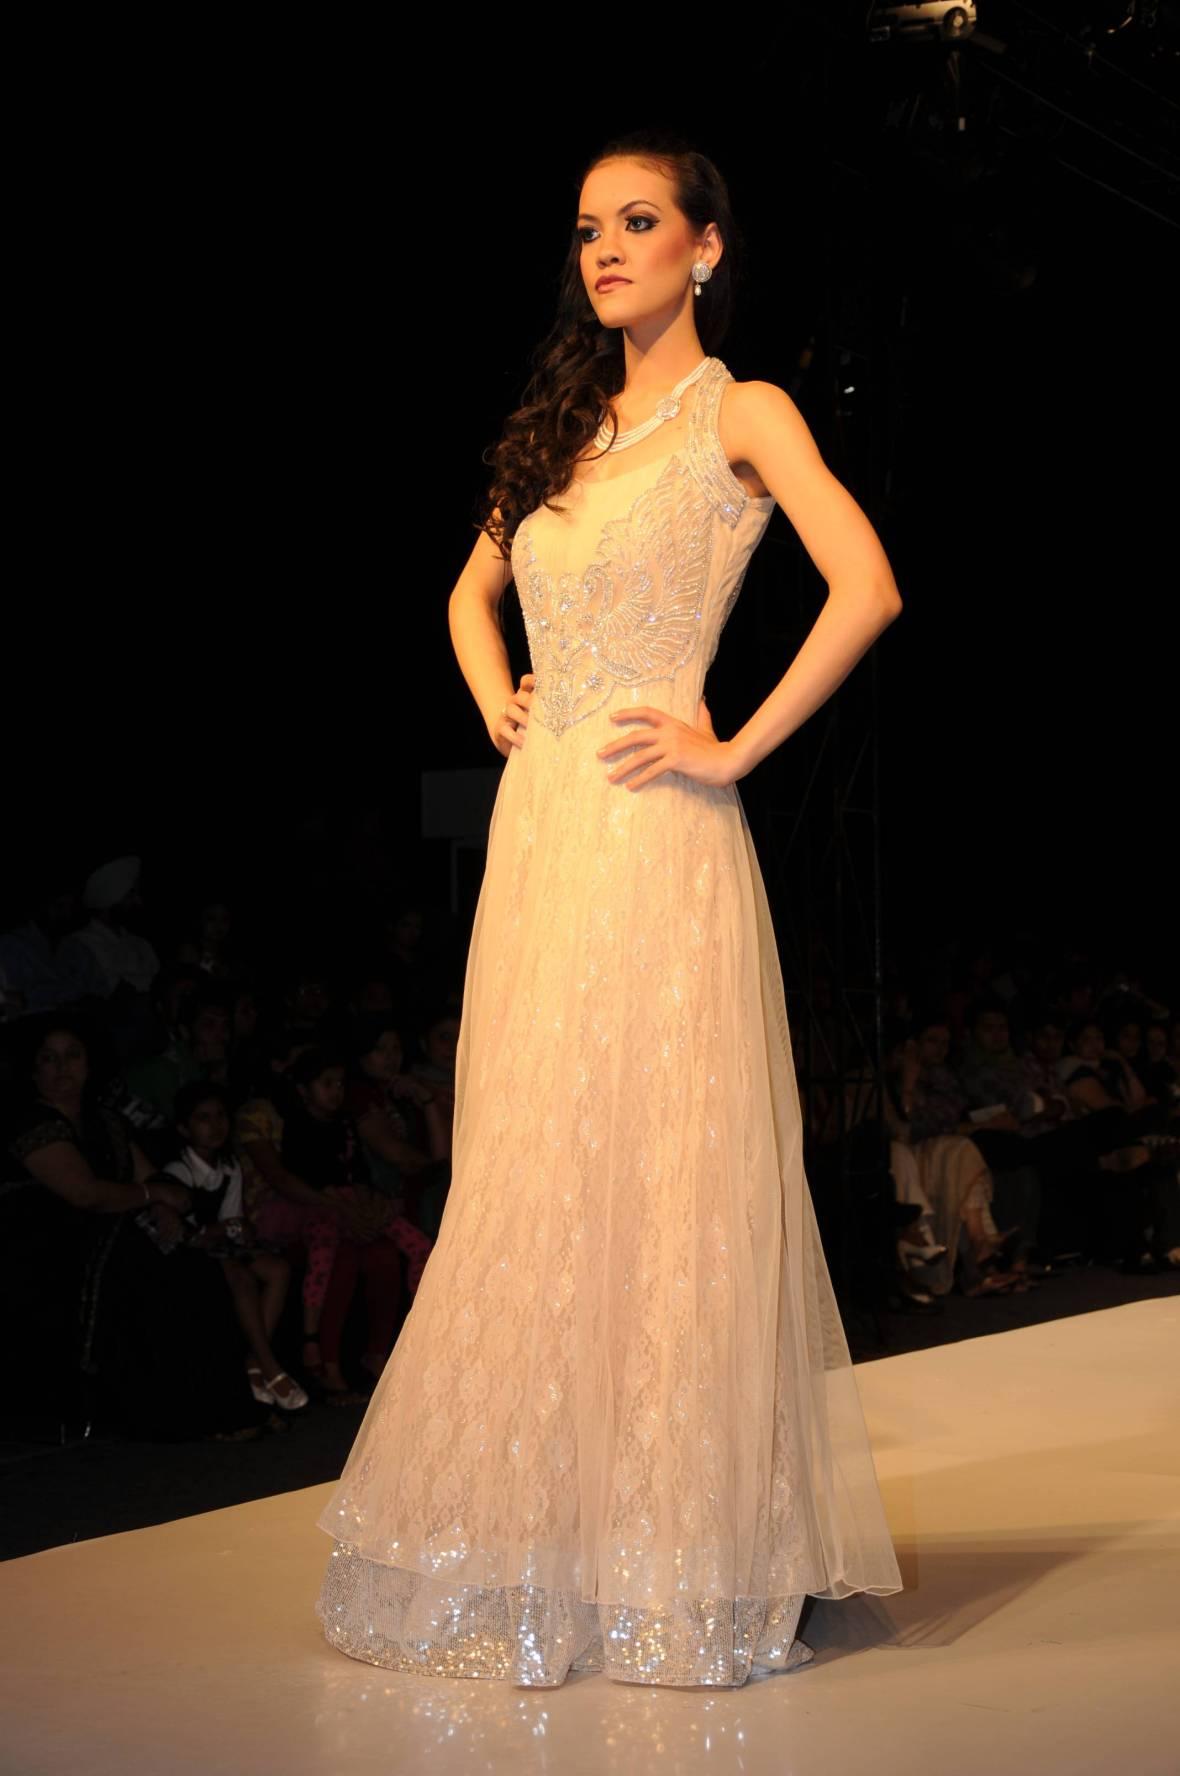 Alana@Model Society International (MSI) Modeling Agency in Bangkok Thailand By Miss Josie Sang (20)